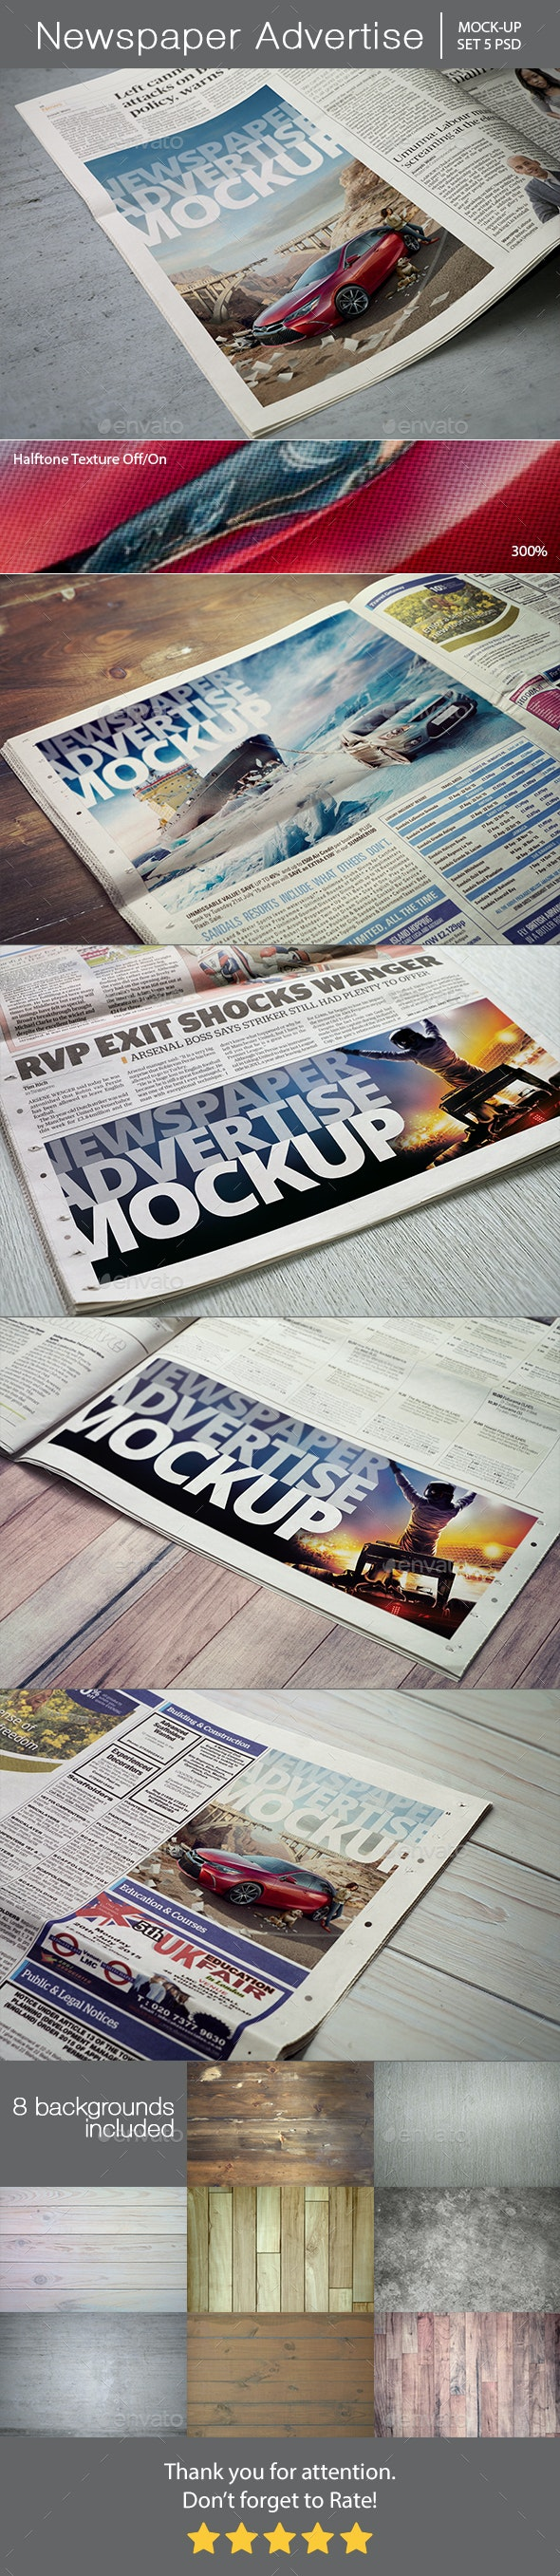 Newspaper Advertise Mockup - Miscellaneous Print